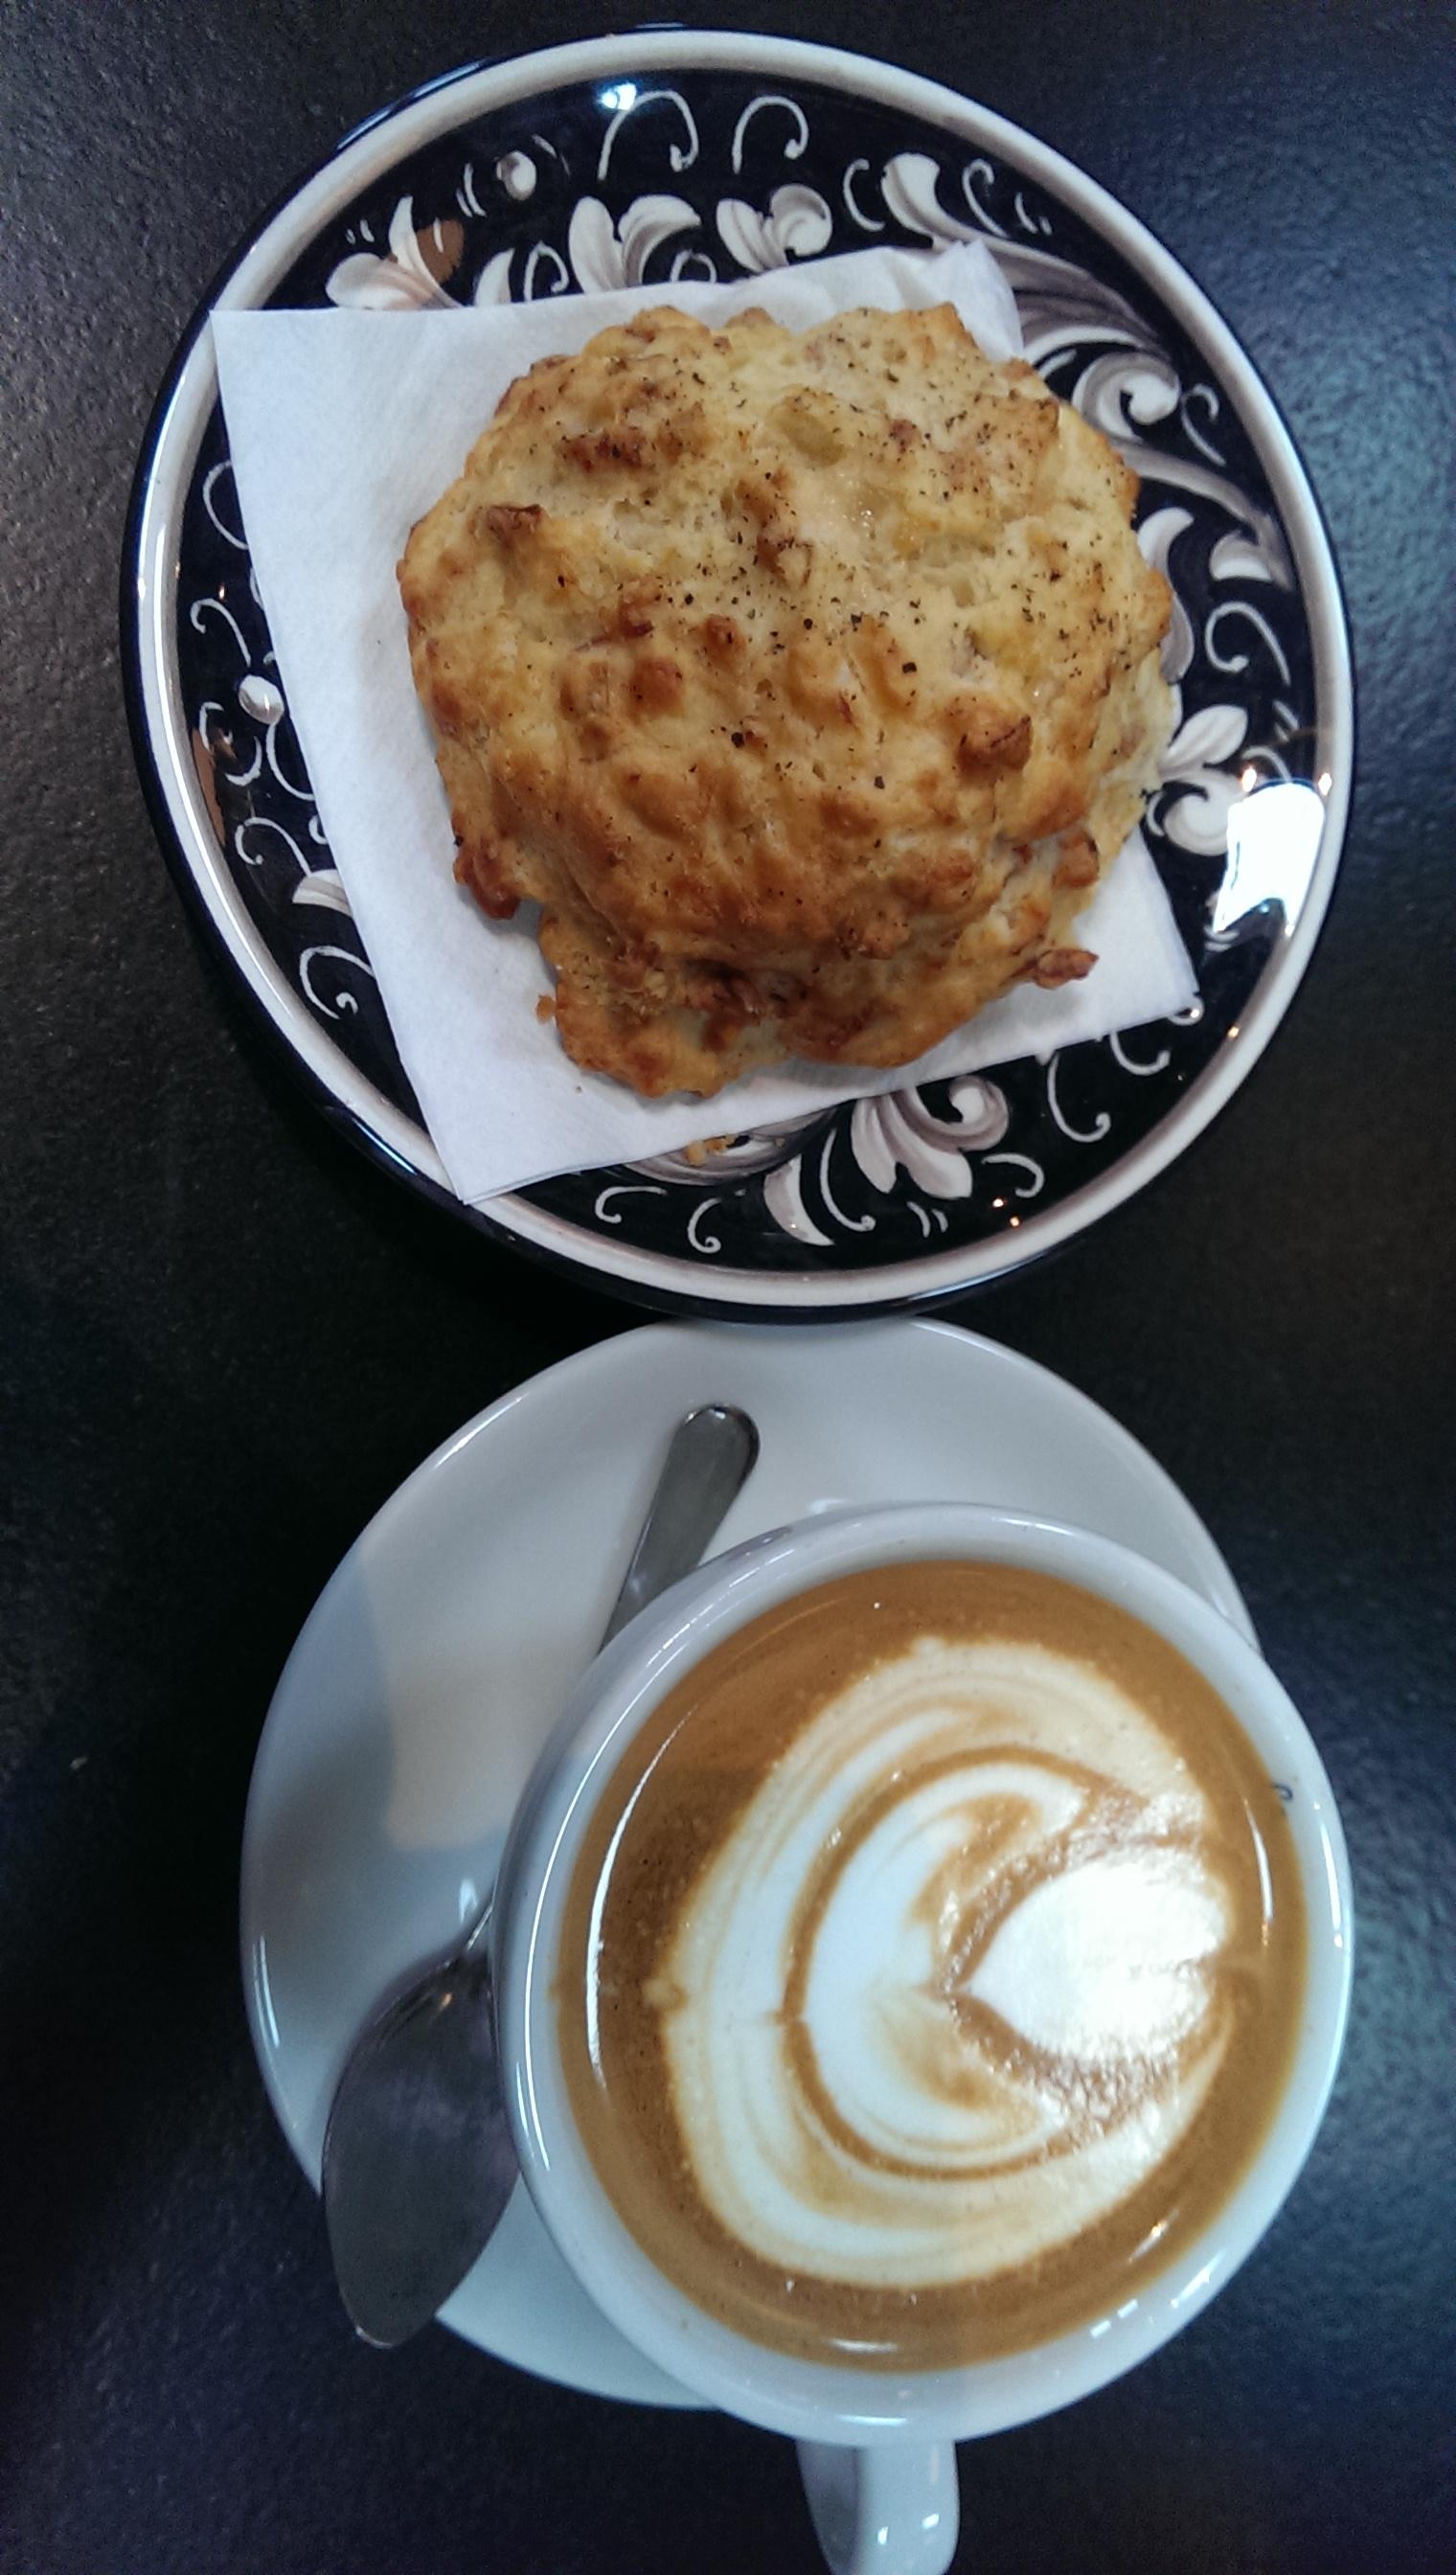 cappuccino and serrano ham biscuit